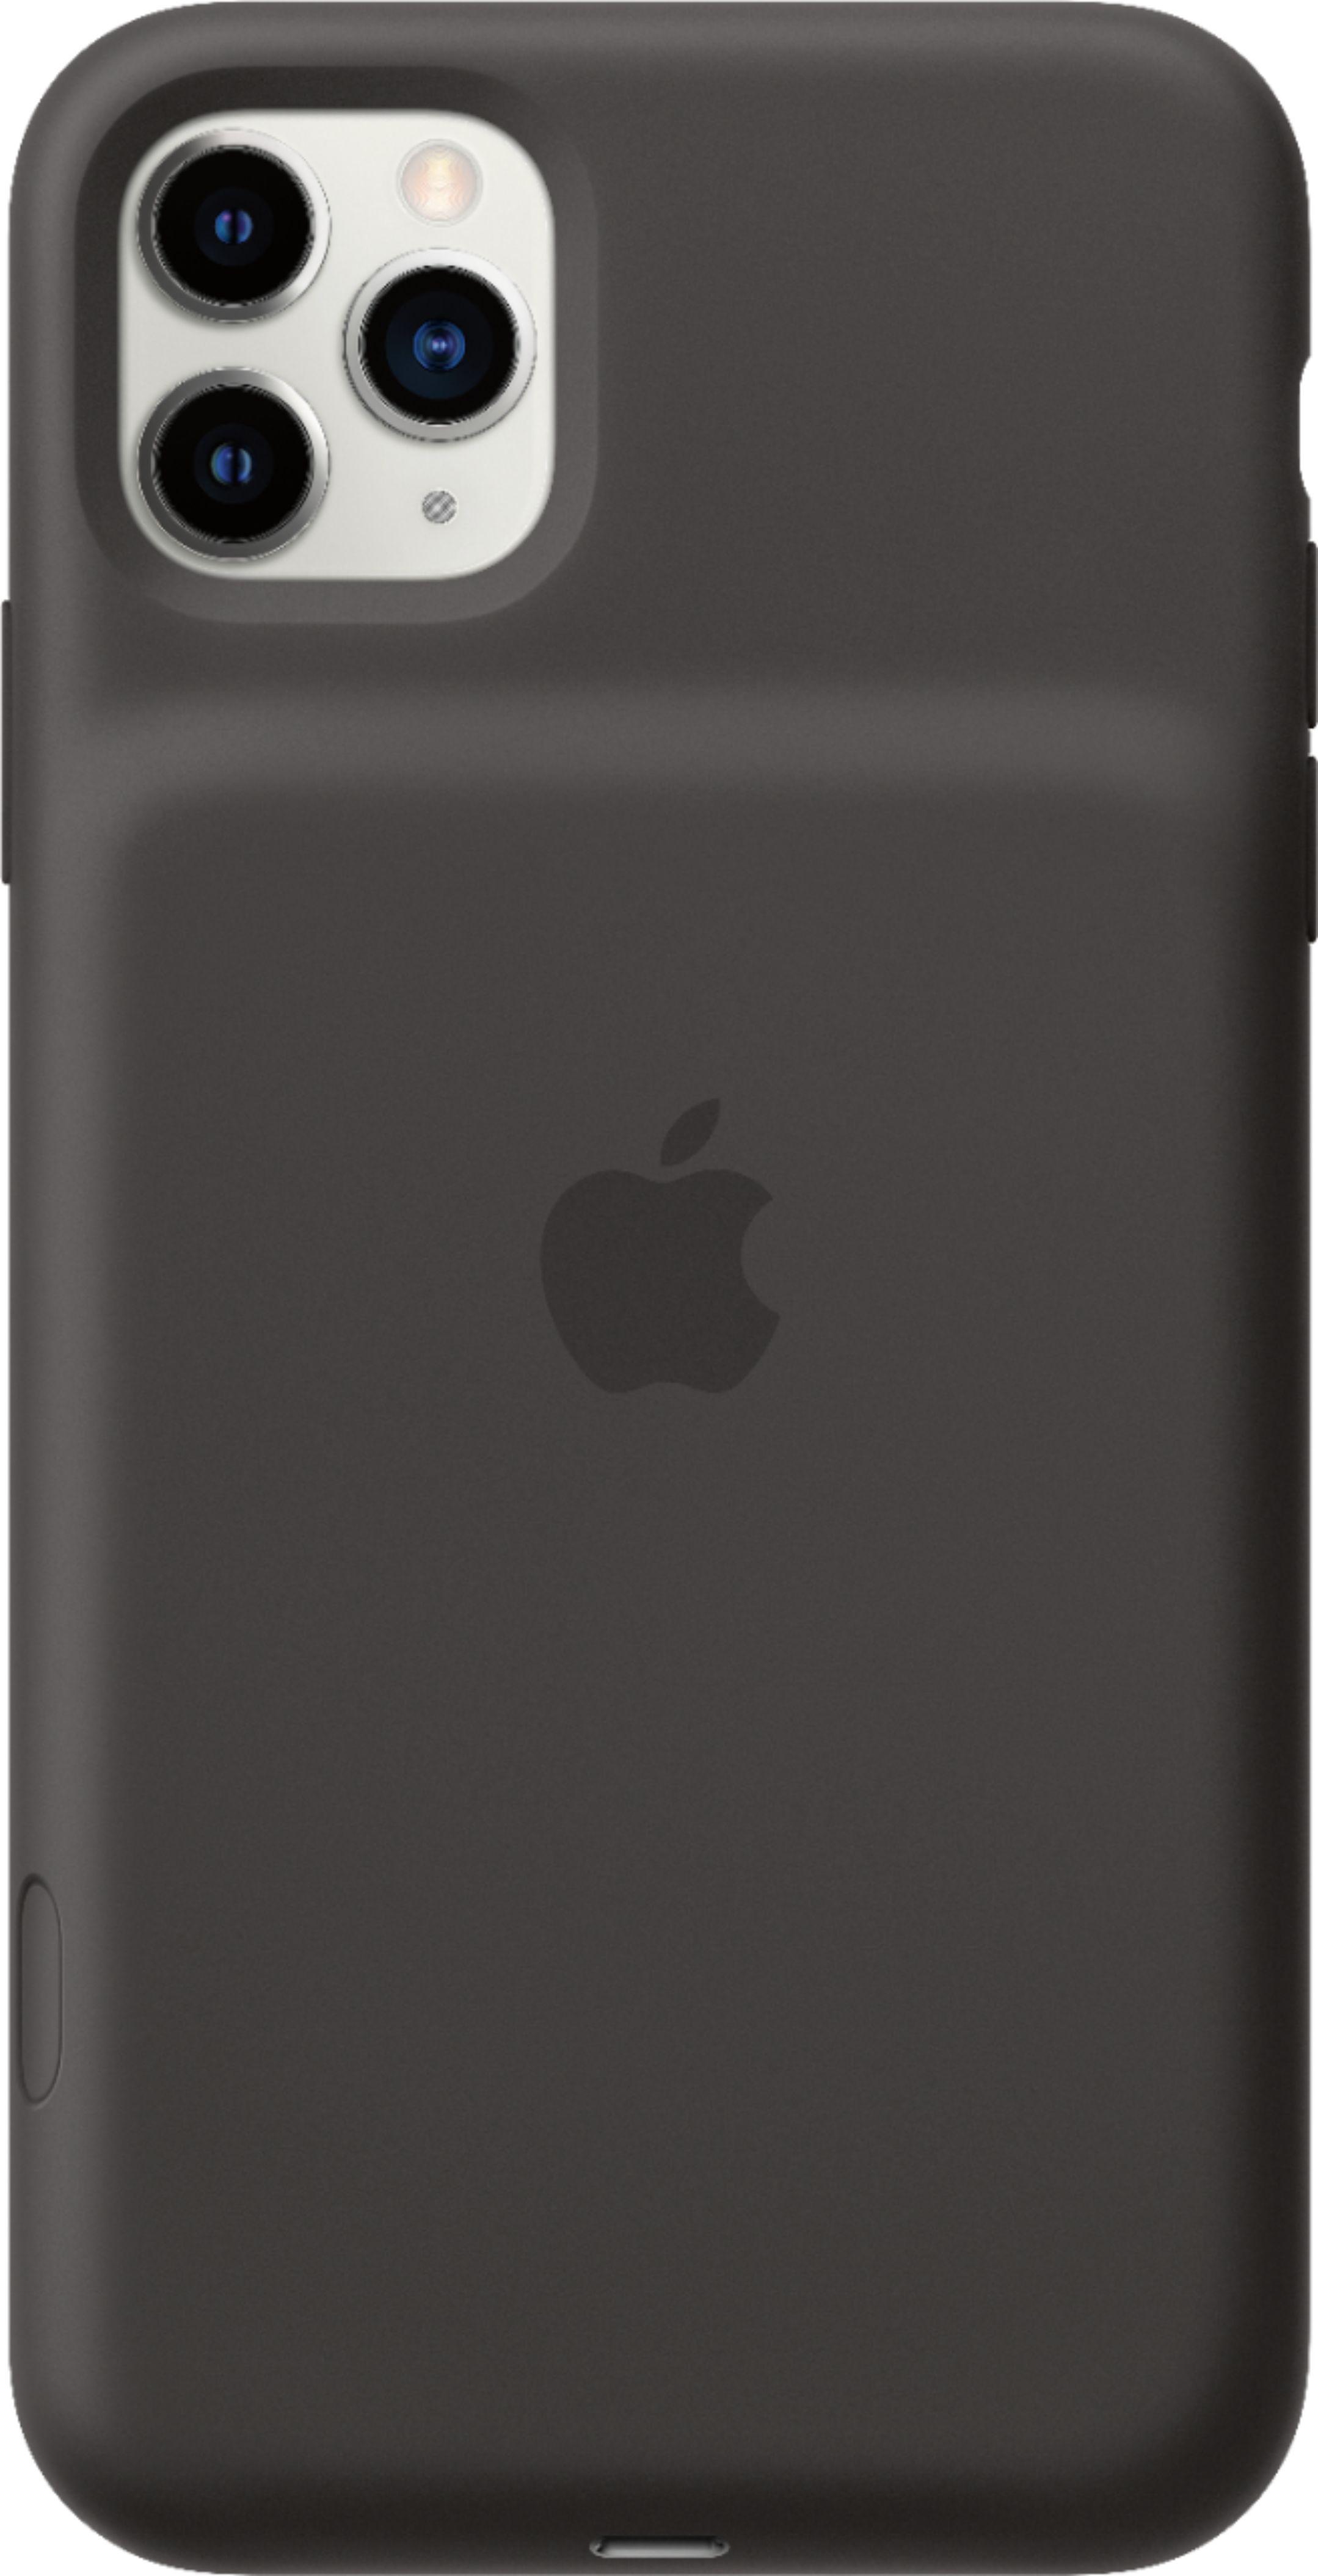 Apple iphone 11 pro max smart battery case black mwvp2lla